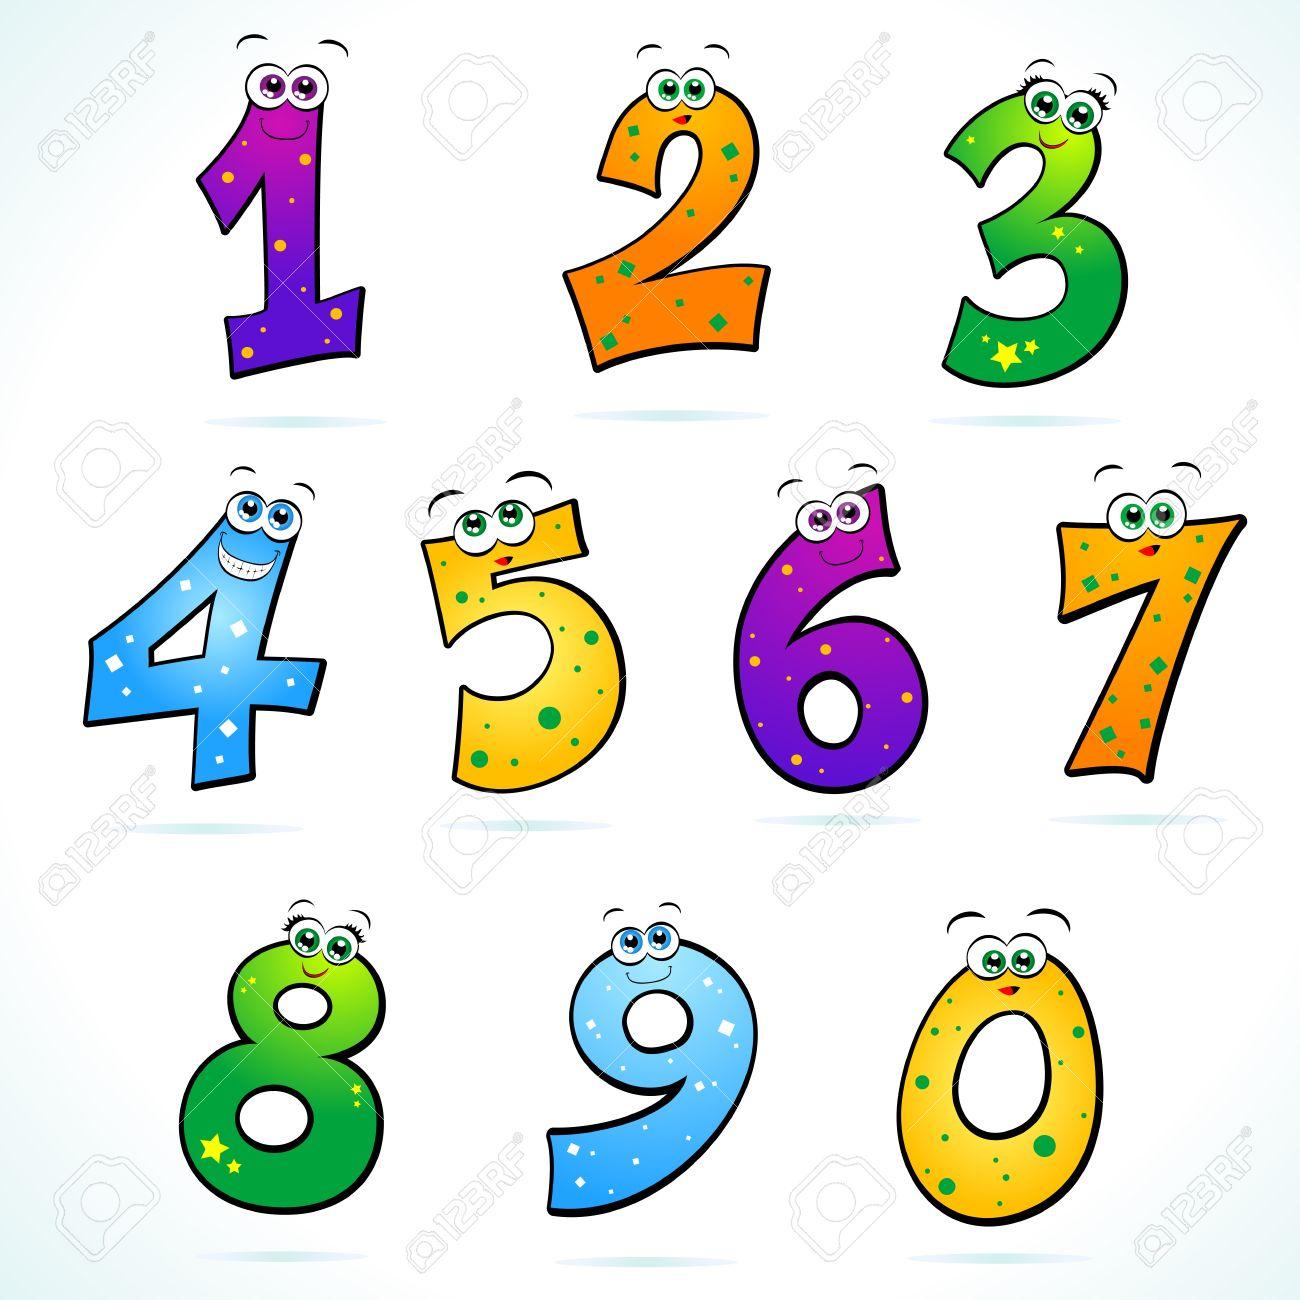 Download Funny Numbers Clipar - Number Clip Art